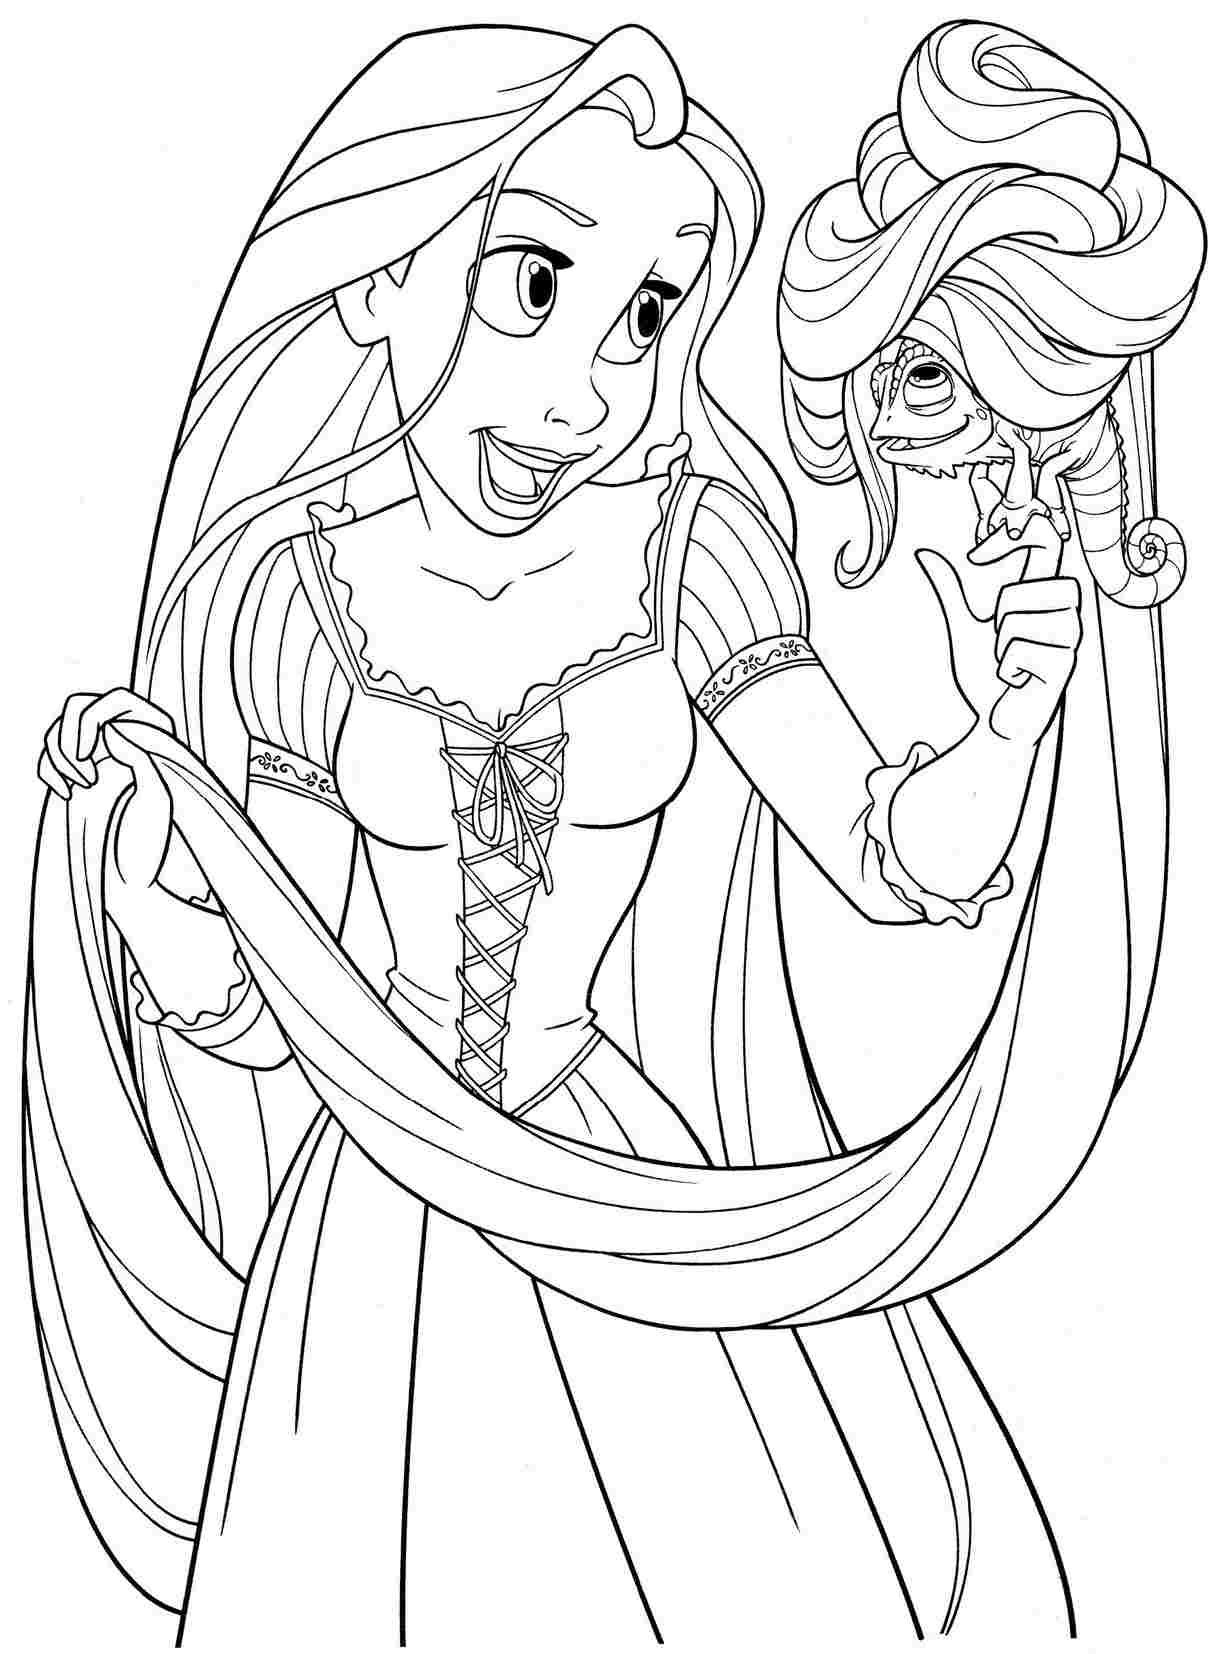 printable free colouring pages disney princess rapunzel ... | disney princess coloring pages printable free